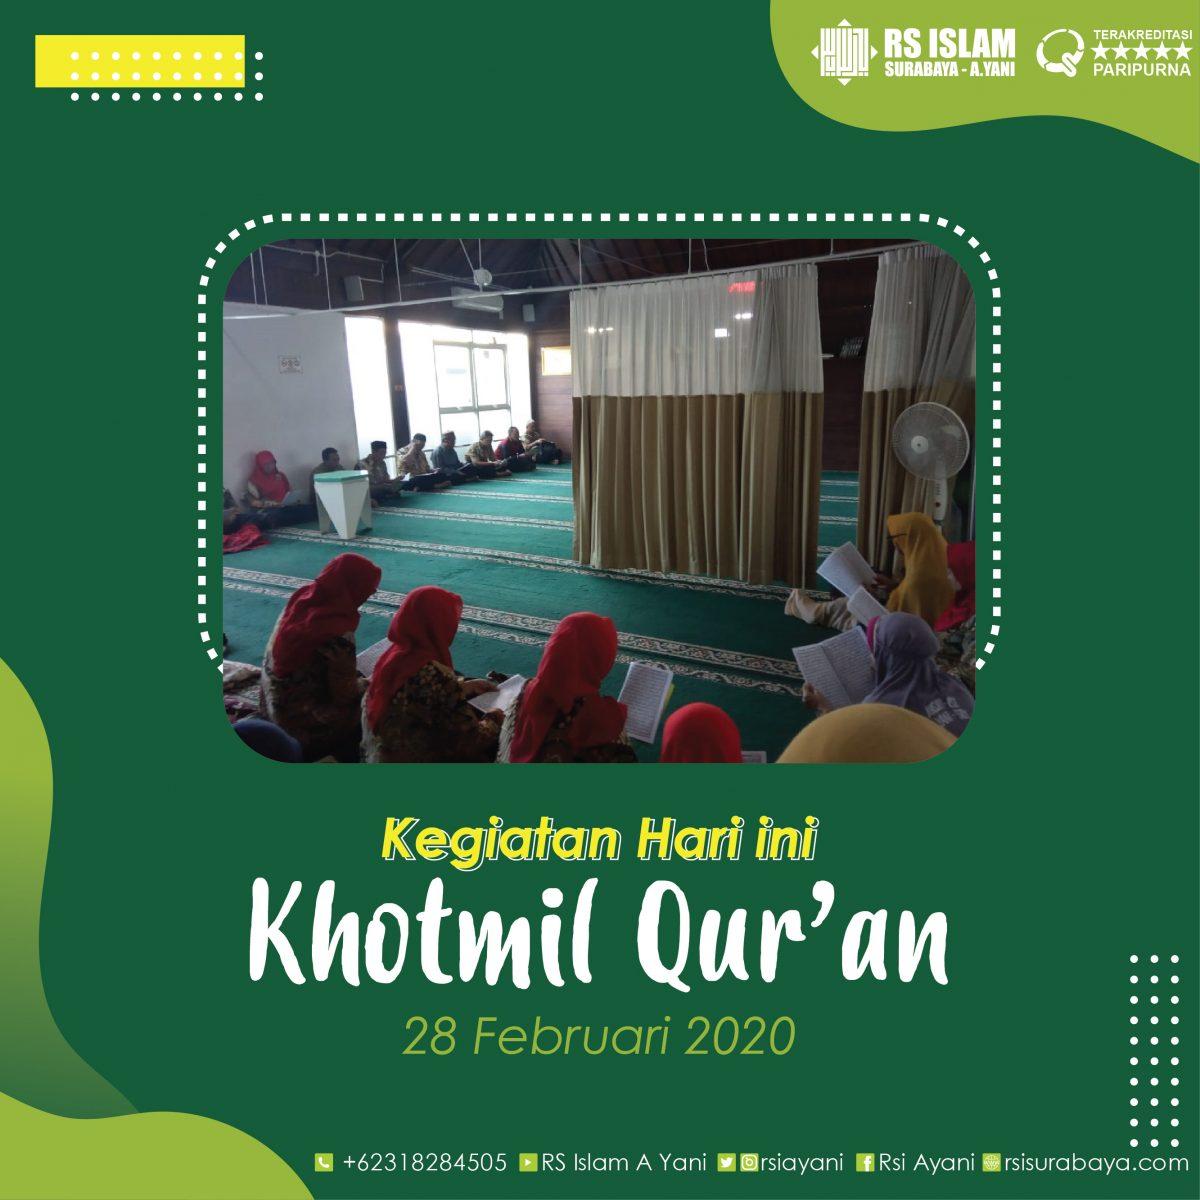 khotmil-quran-01-1200x1200.jpg